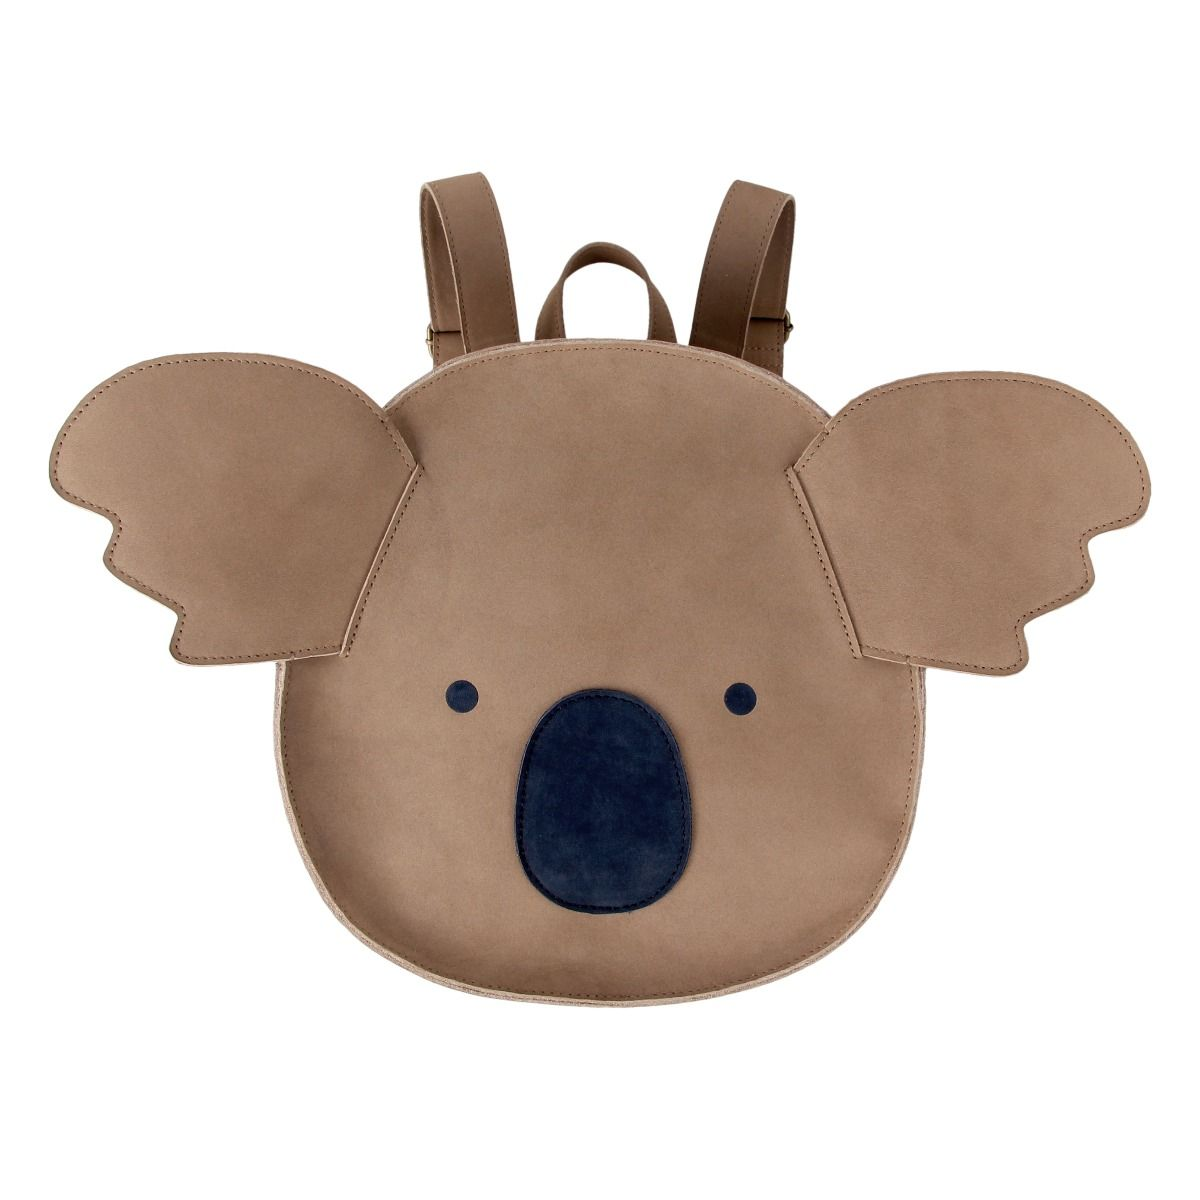 Umi Schoolbag   Koala